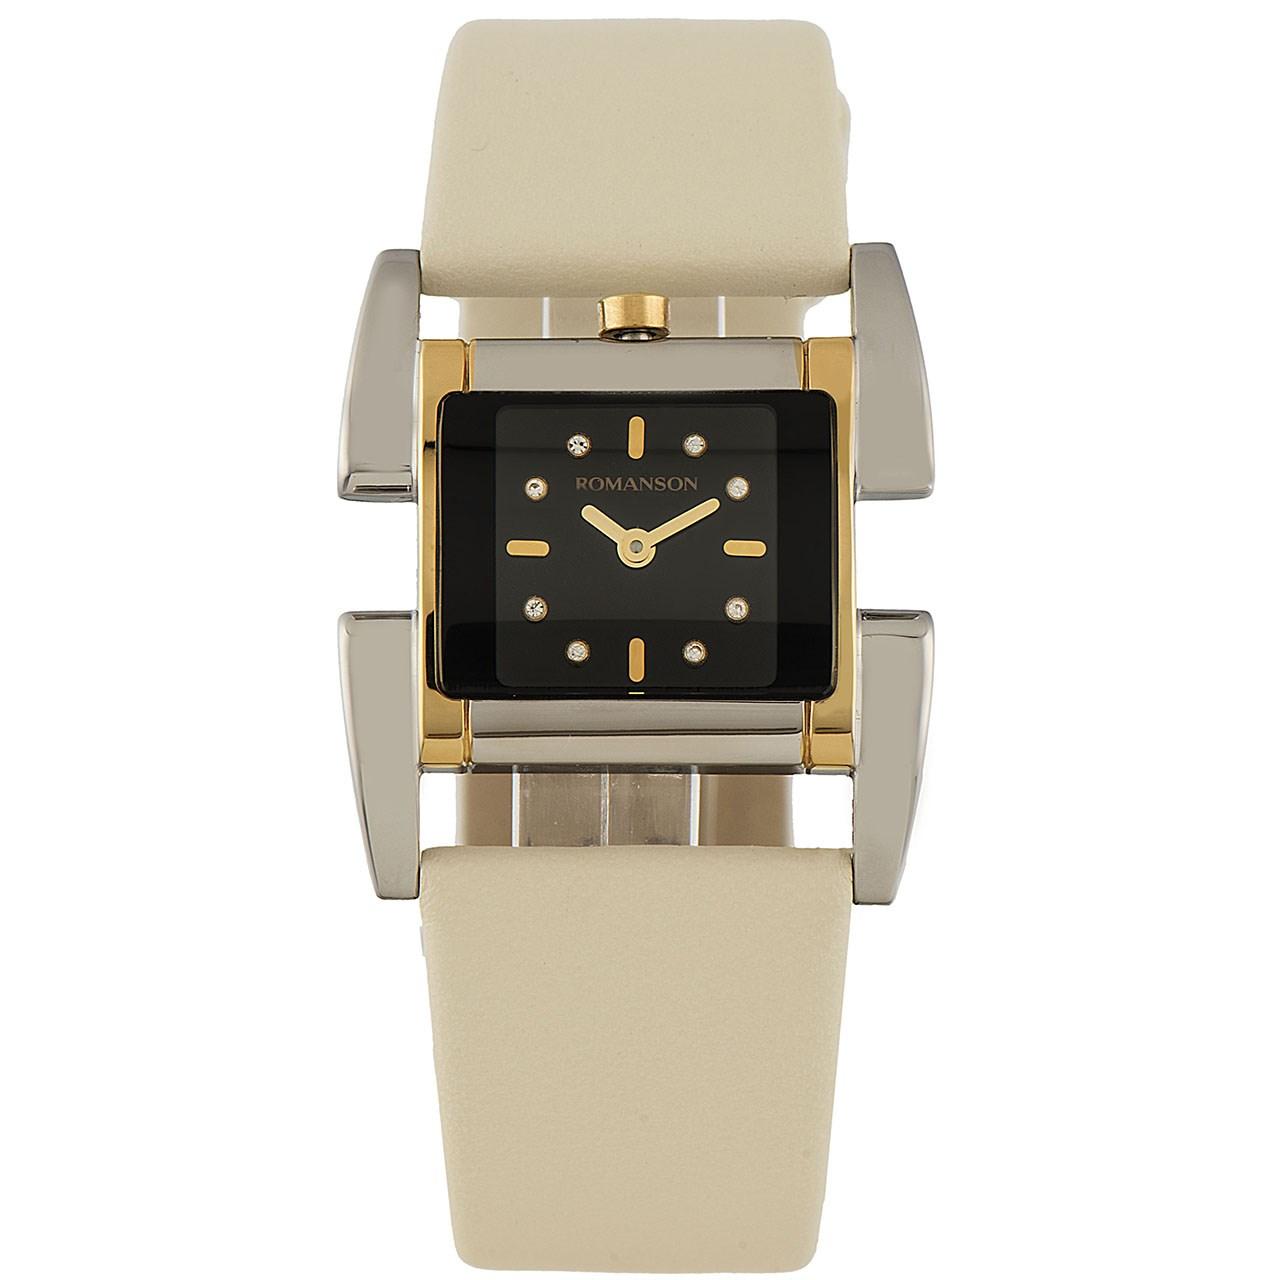 ساعت مچی عقربه ای زنانه رومانسون مدل RL1201LL2CA31G